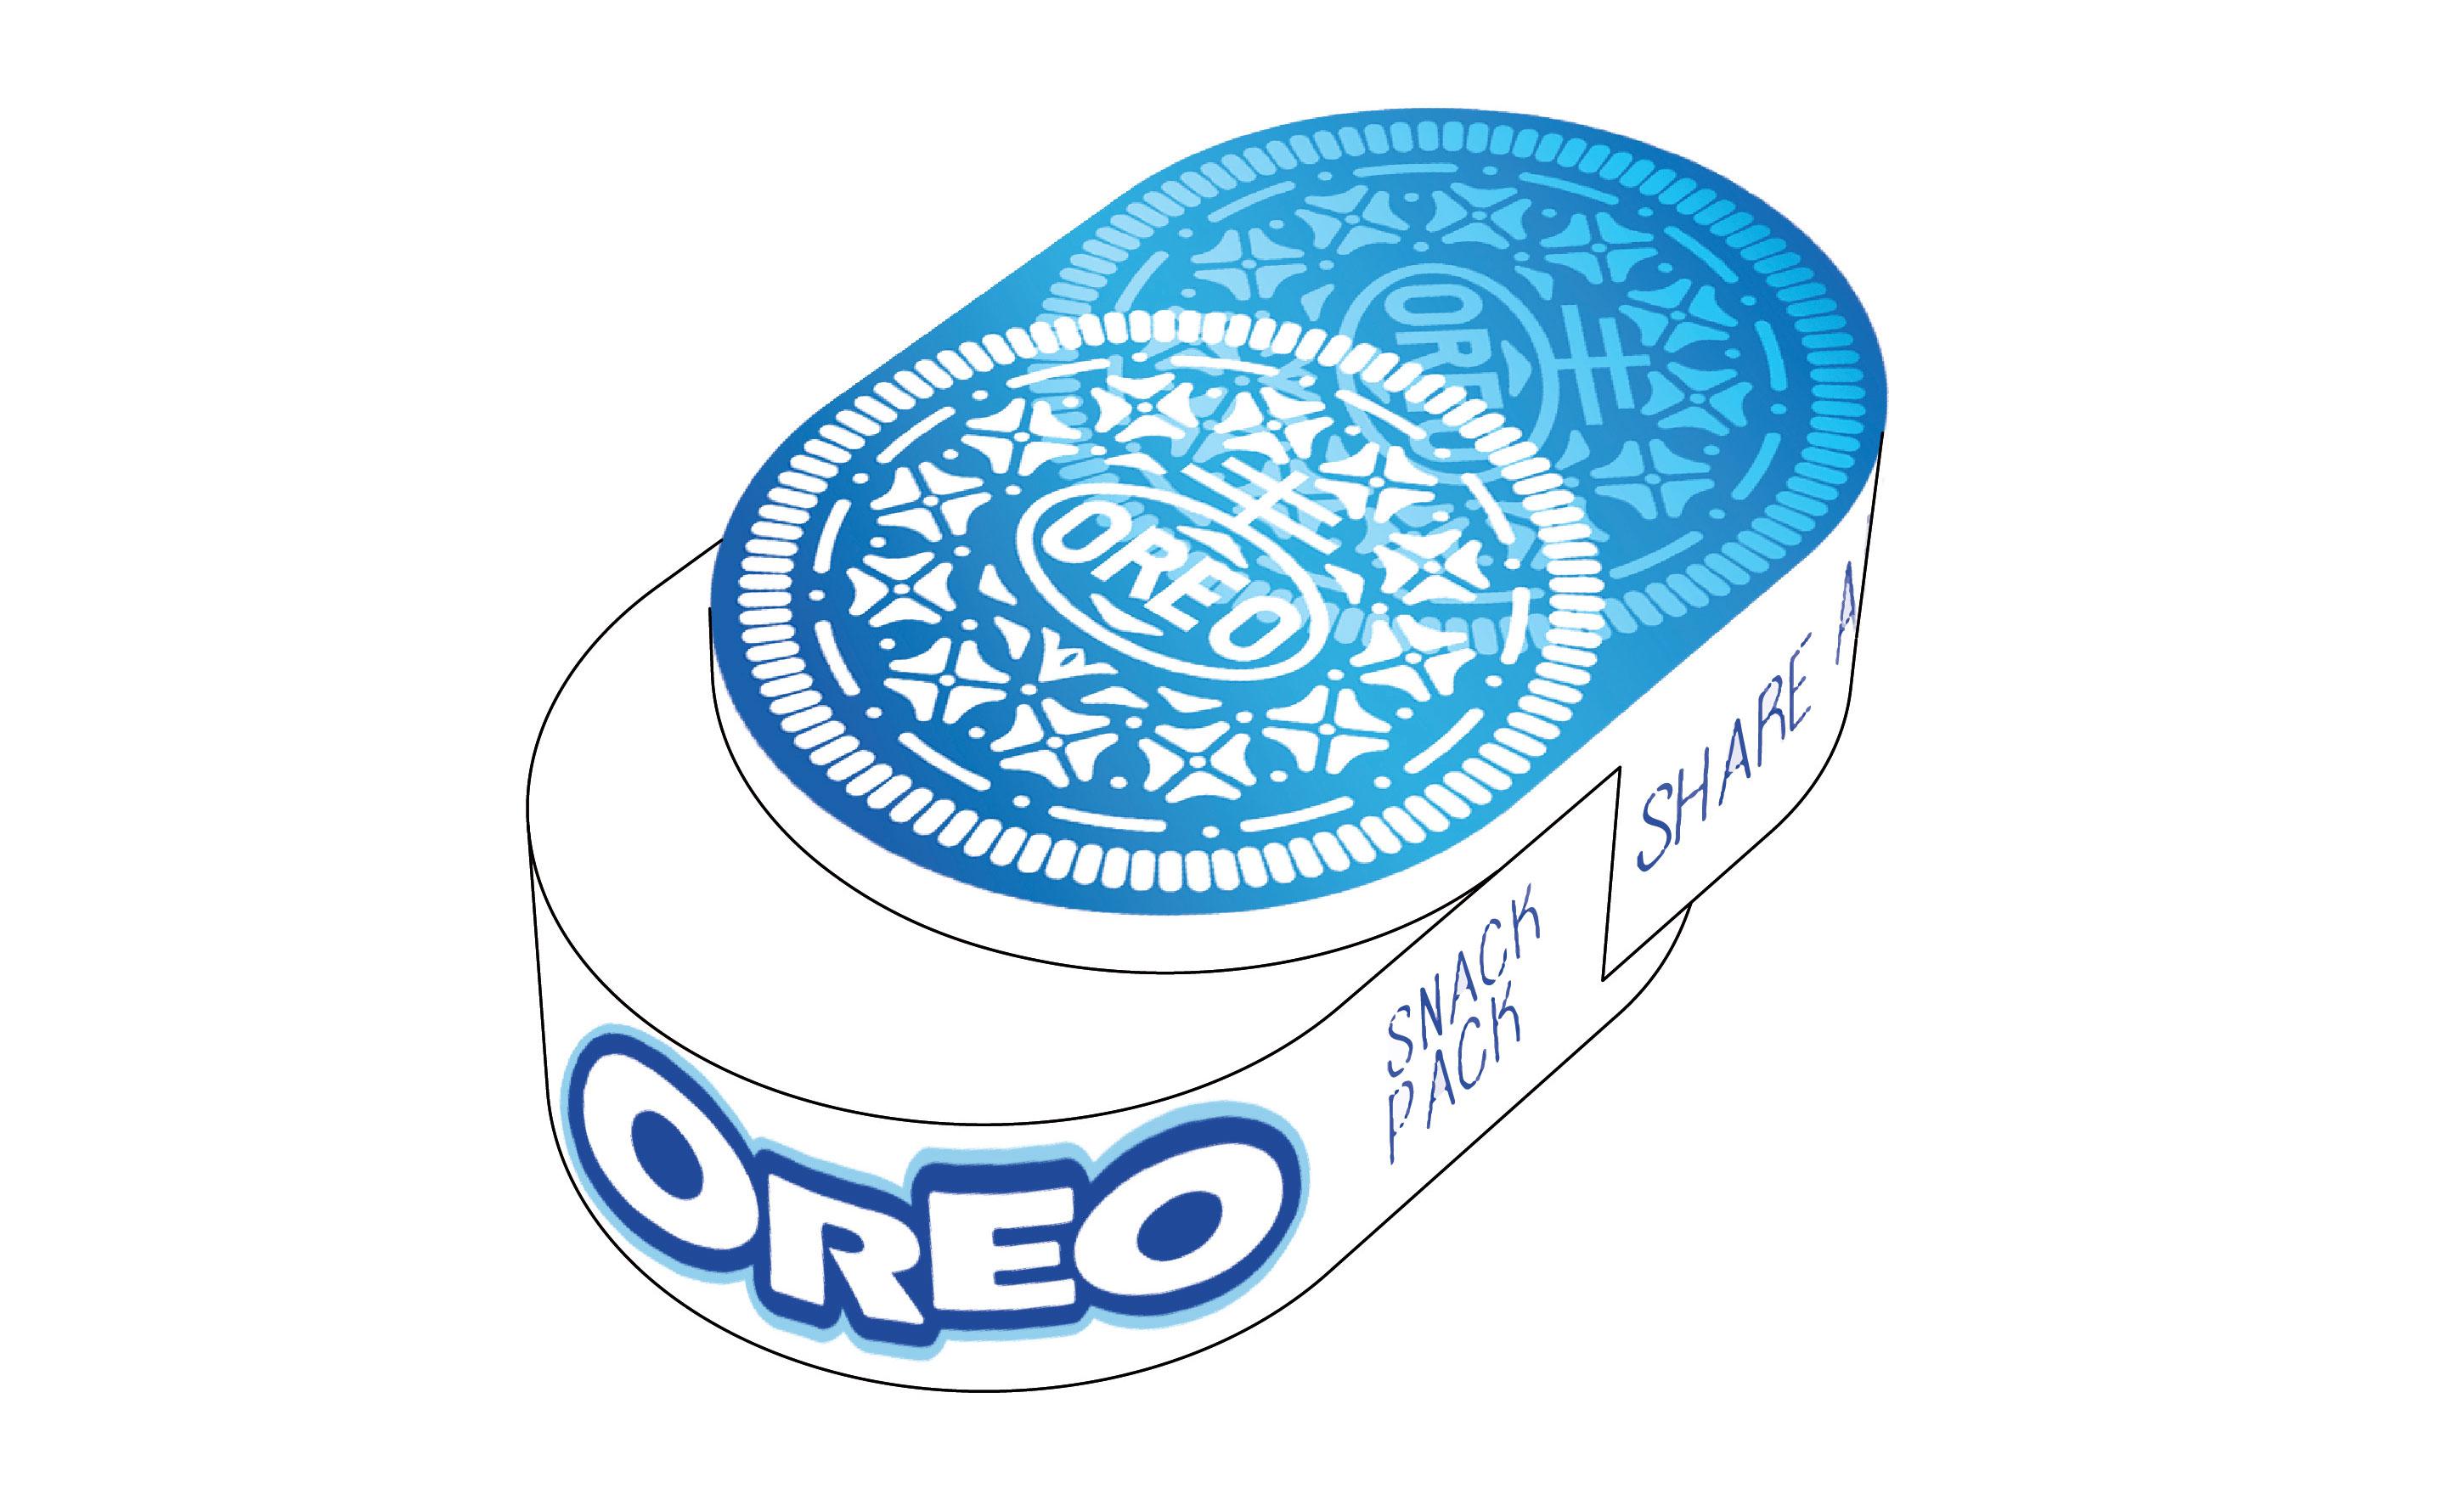 Oreo Snack Pack